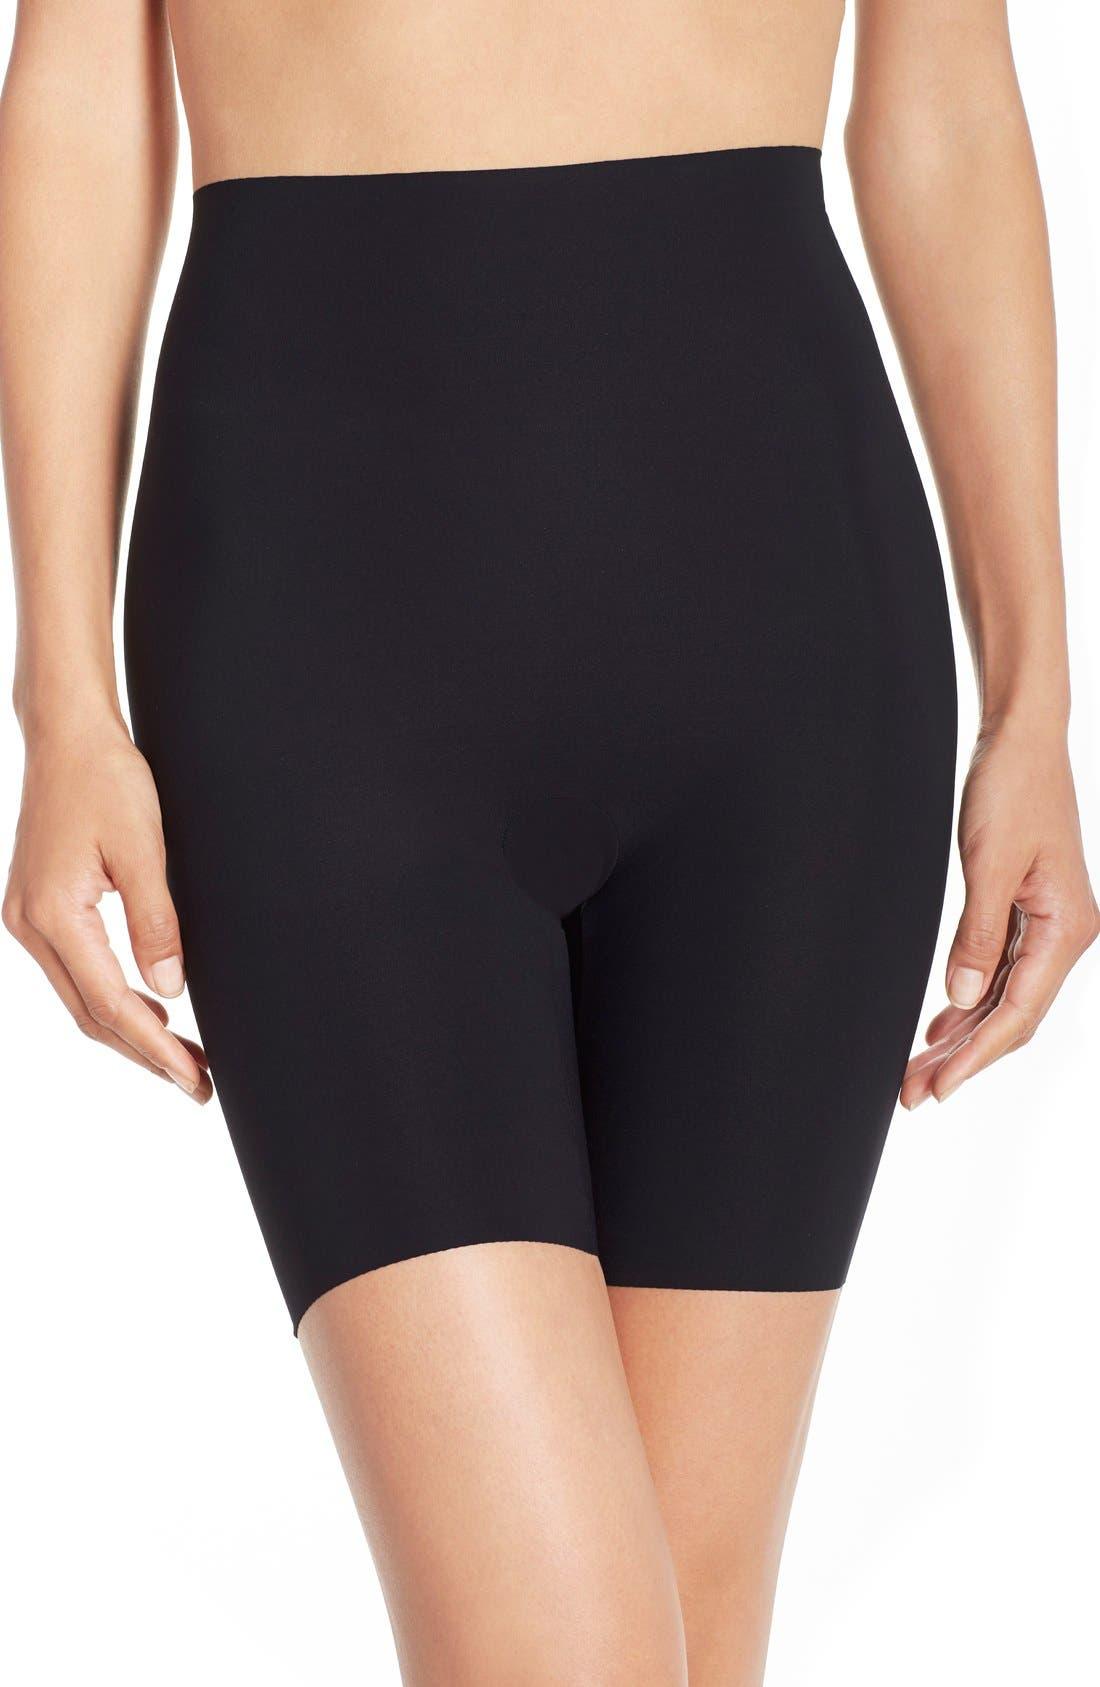 COMMANDO, 'Control' High Waist Shaping Shorts, Main thumbnail 1, color, BLACK